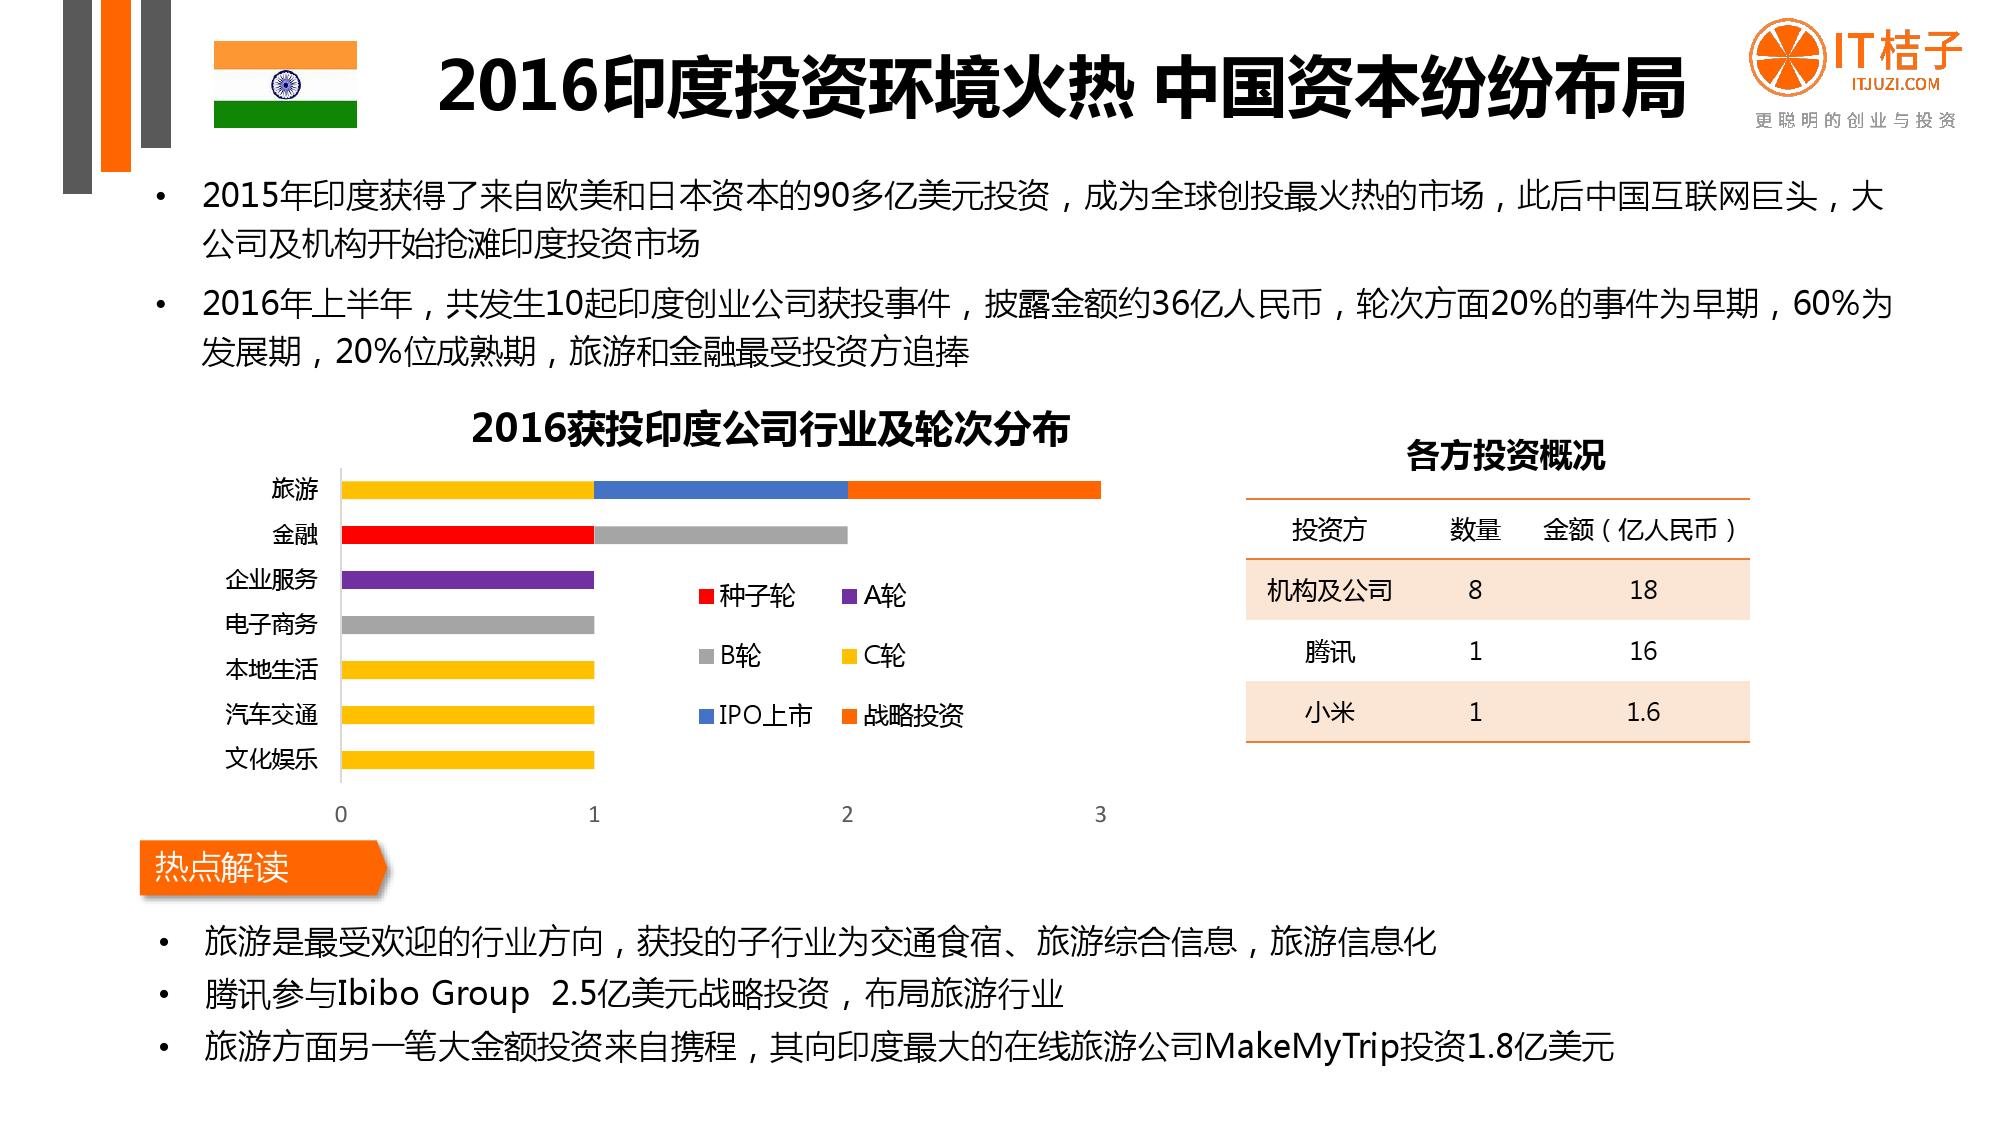 【IT桔子】2016年Q2中国互联网创业投资分析报告_000049